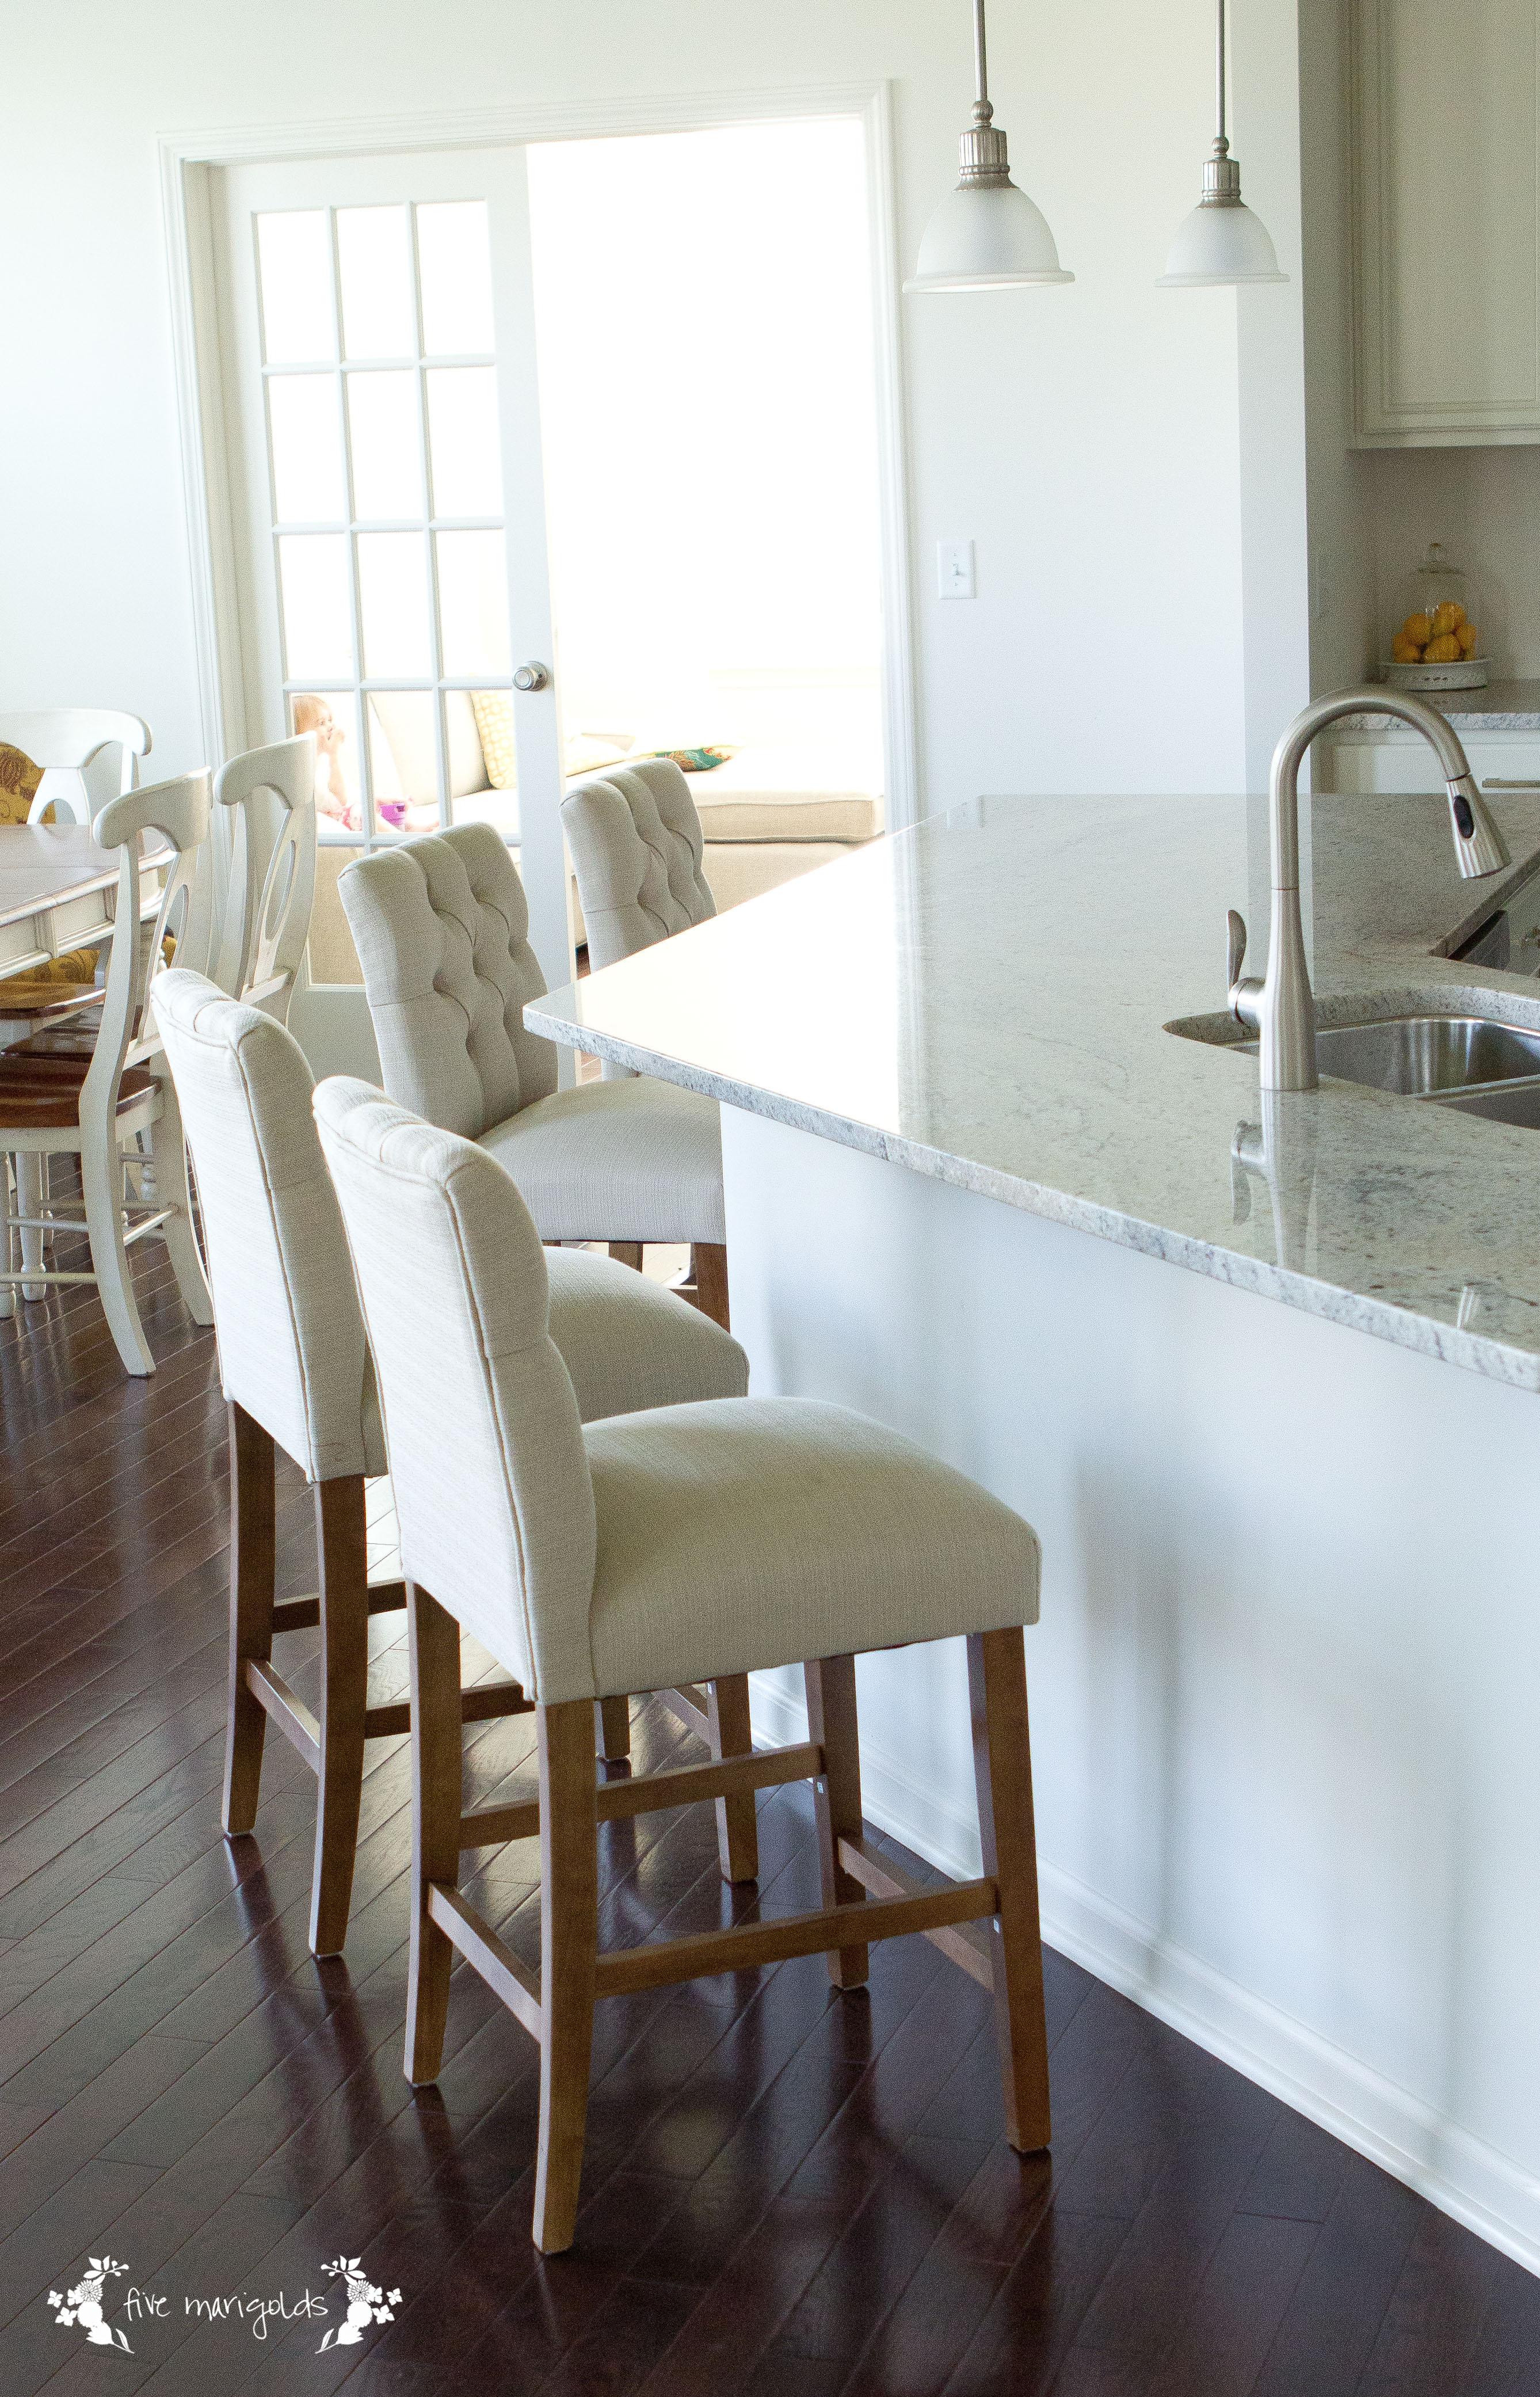 target brookline stools review five marigolds